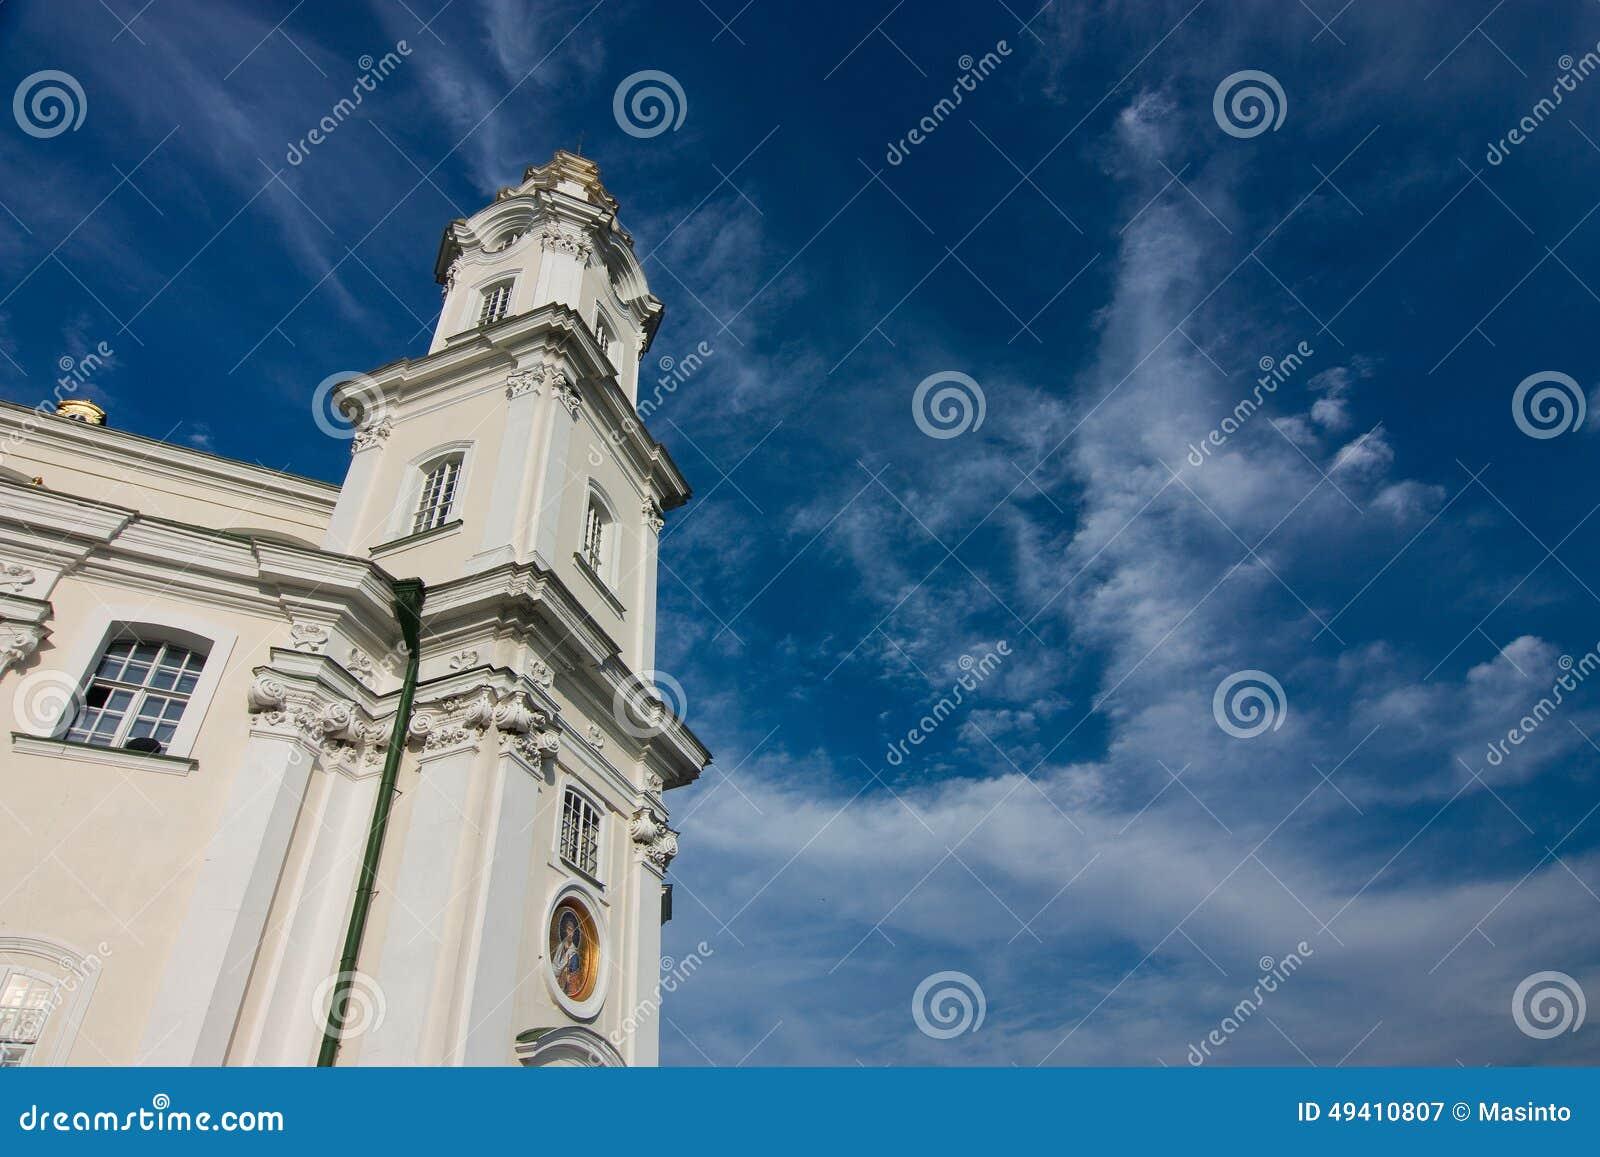 Download Turm des Tempels stockbild. Bild von monastery, himmel - 49410807